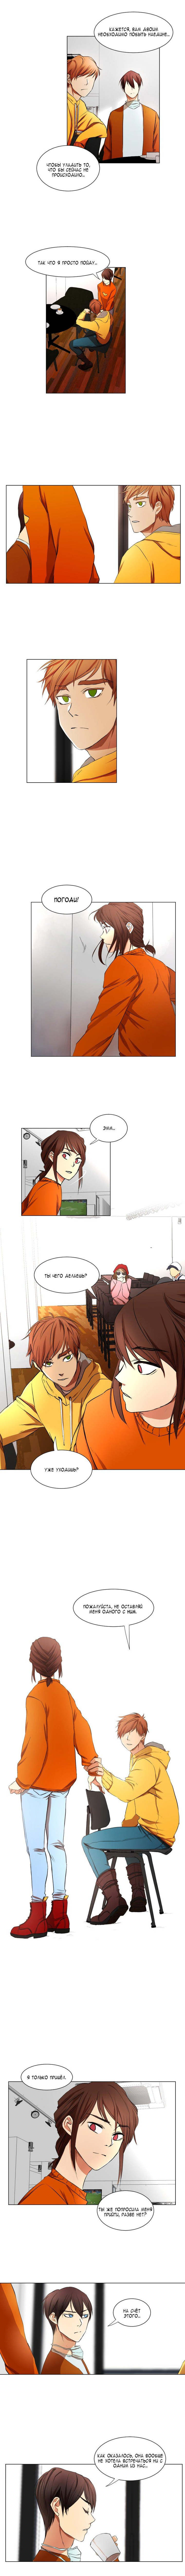 Манга Я люблю Ю / I love Yoo  - Том 1 Глава 17 Страница 2